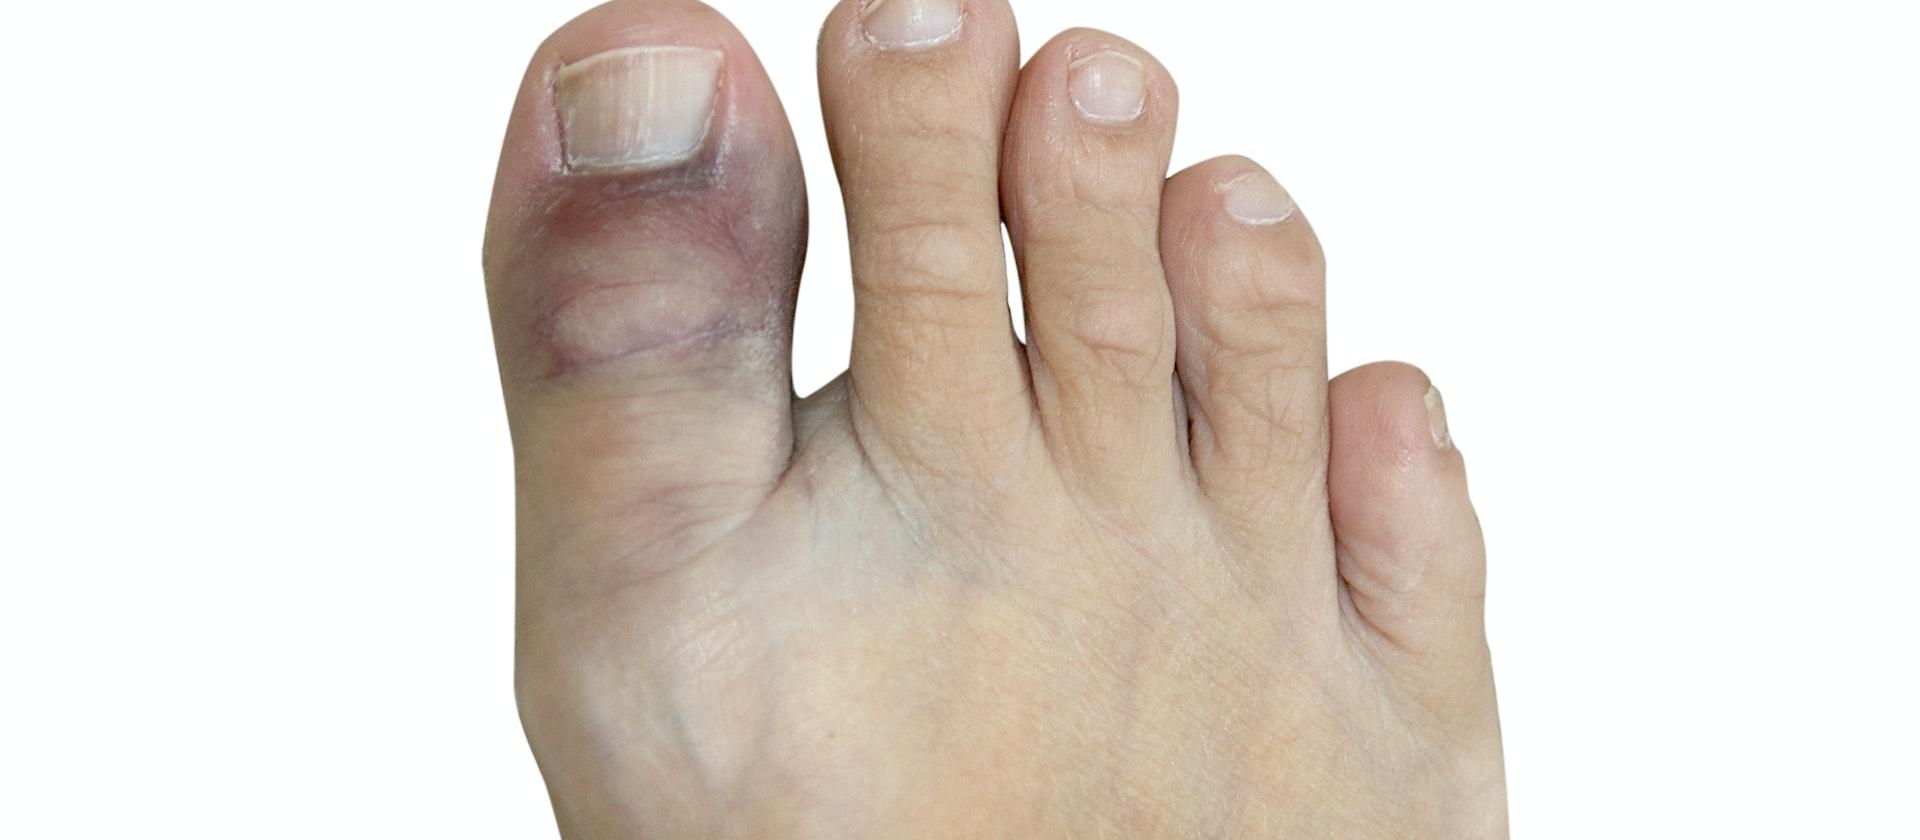 Toenail Pain Symptoms Causes Treatment Options Buoy